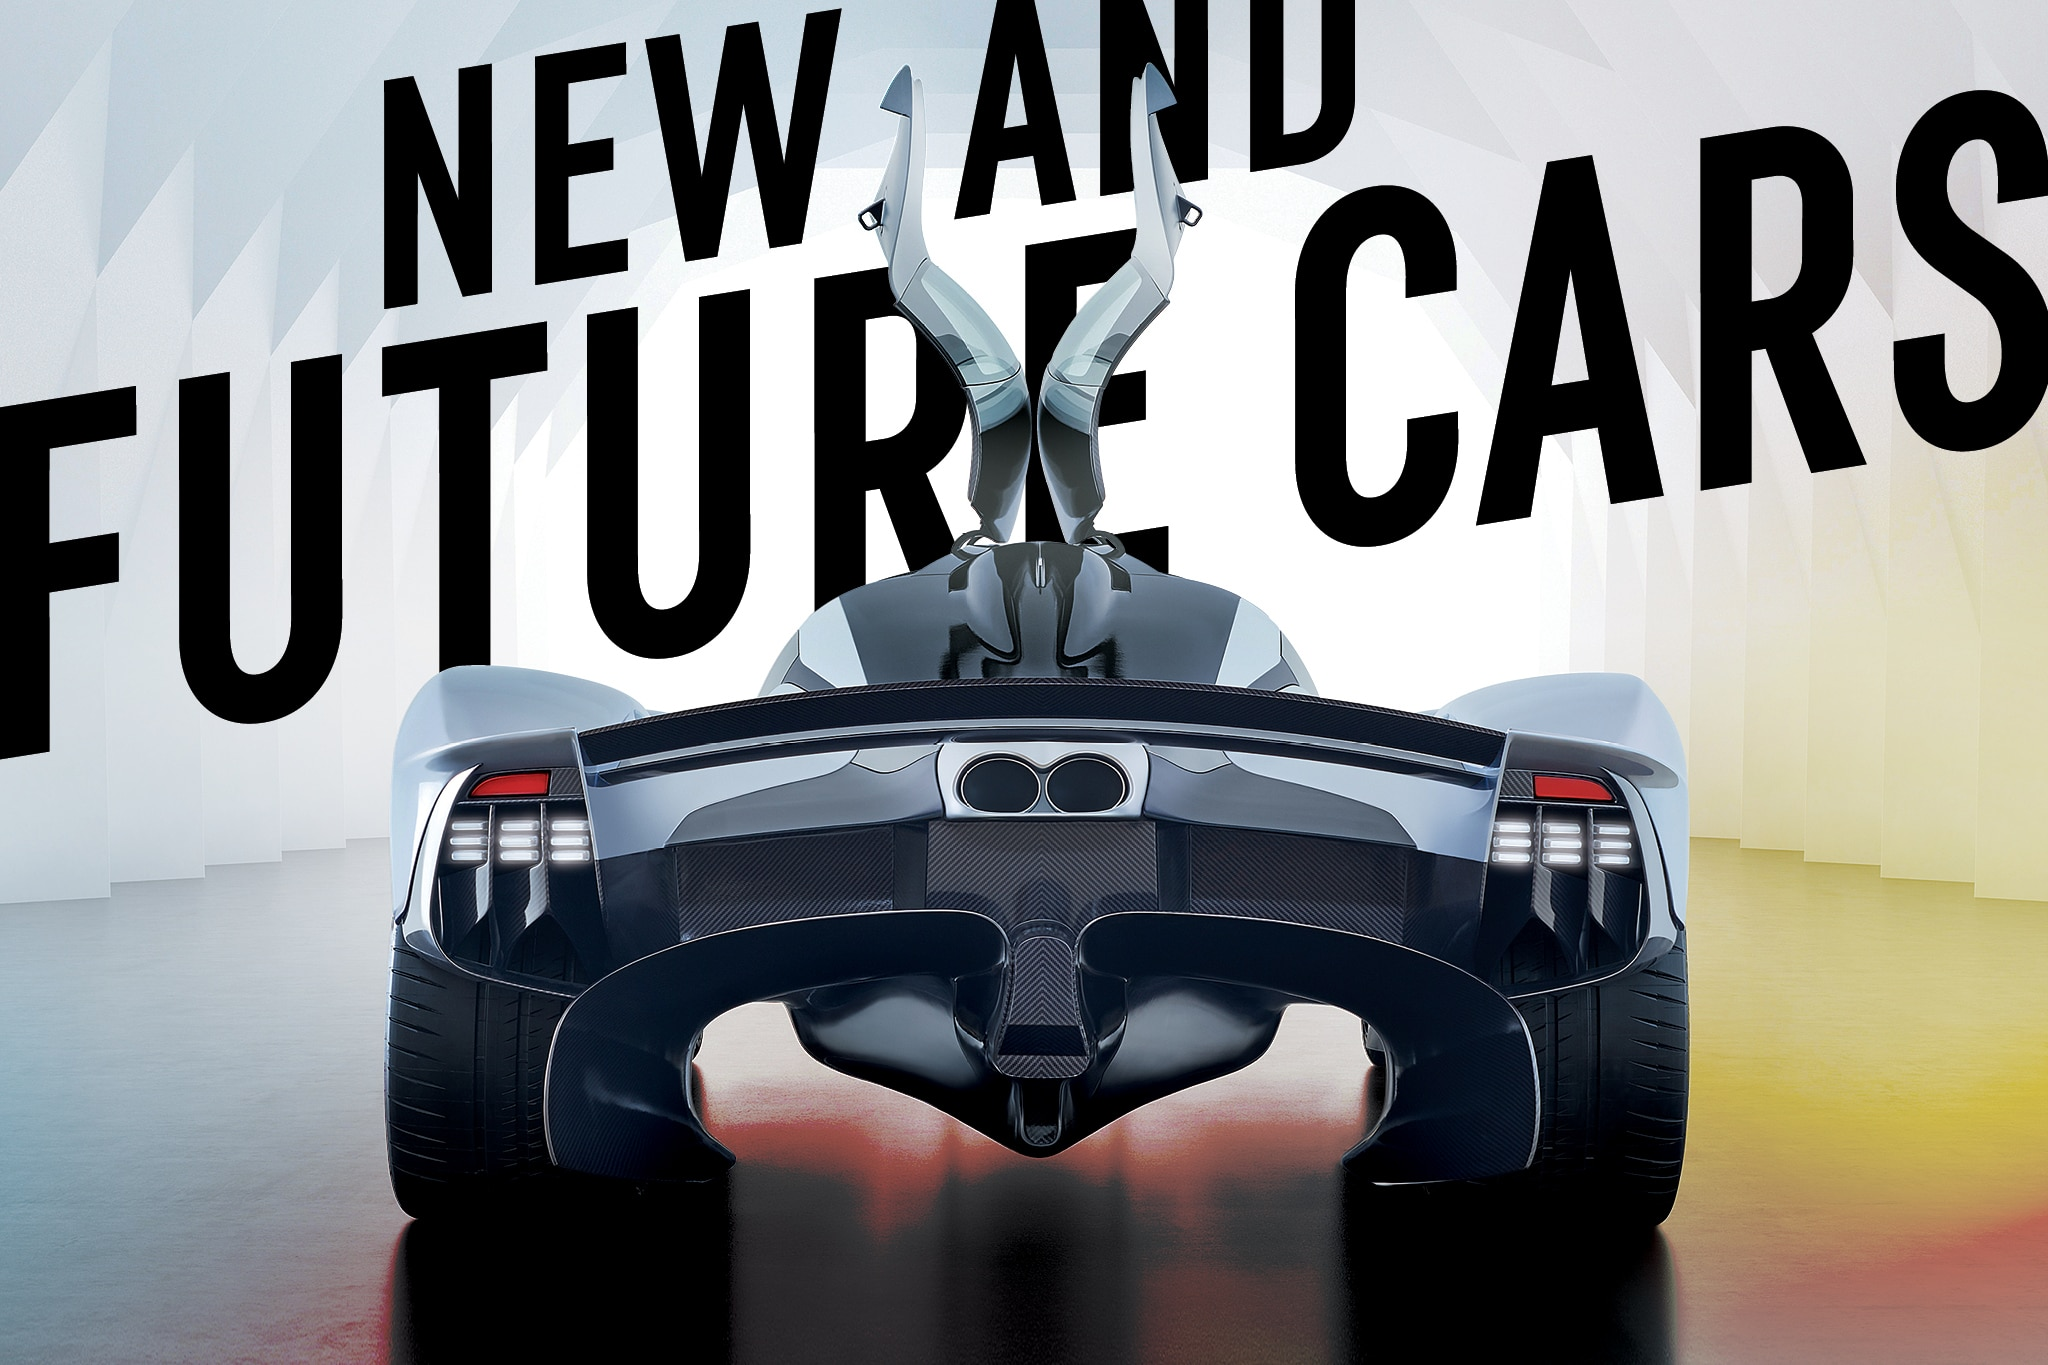 NewandFutureCars Header